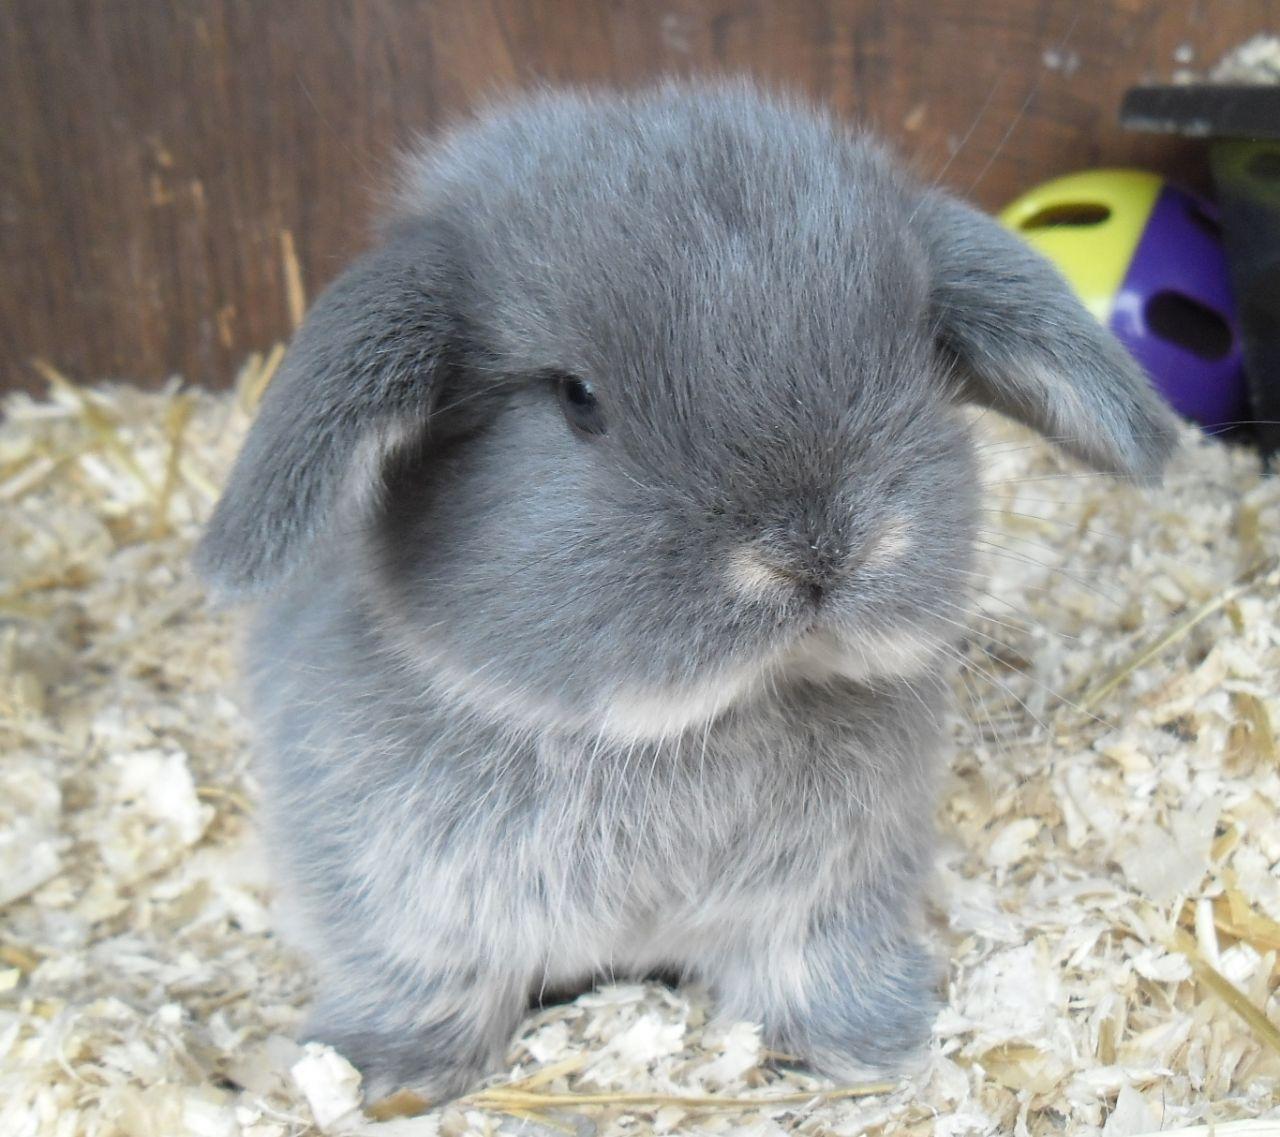 Very Friendly Mini Lop Rabbit For Sale Bury St Edmunds Suffolk Pets4homes Mini Lop Rabbit Mini Lop Rabbits For Sale